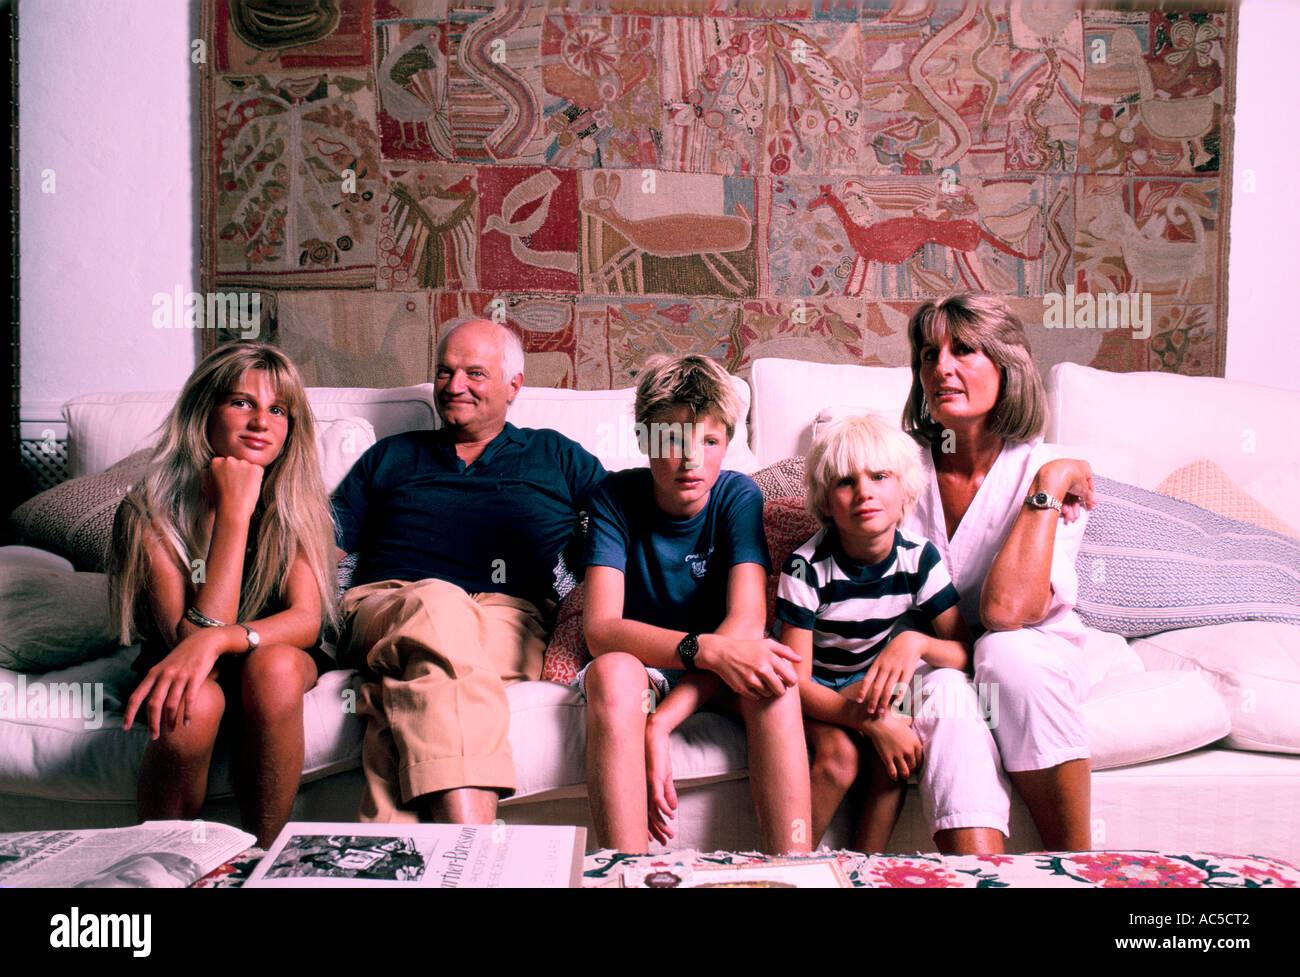 SIR JAMES GOLDSMITH FAMILY MARBELLA - Stock Image